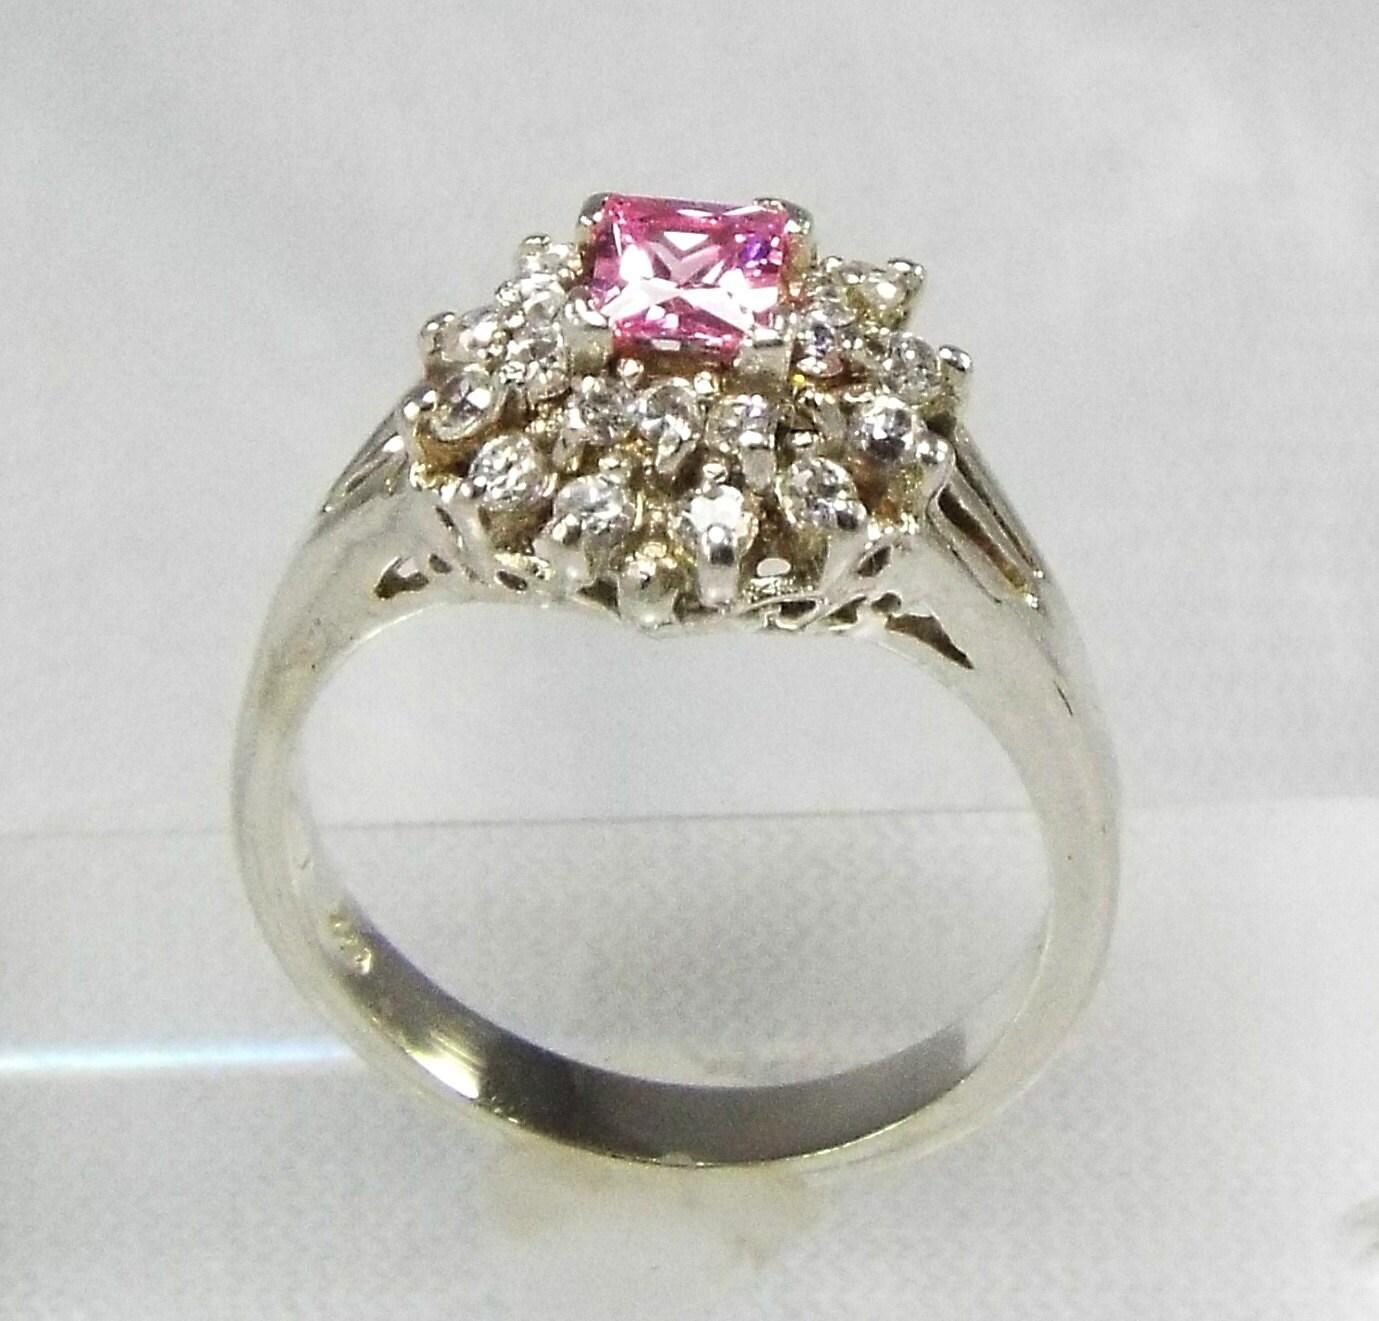 Ring Tiered Pink Princess Ring Illuminated Diamond  Tower Ring